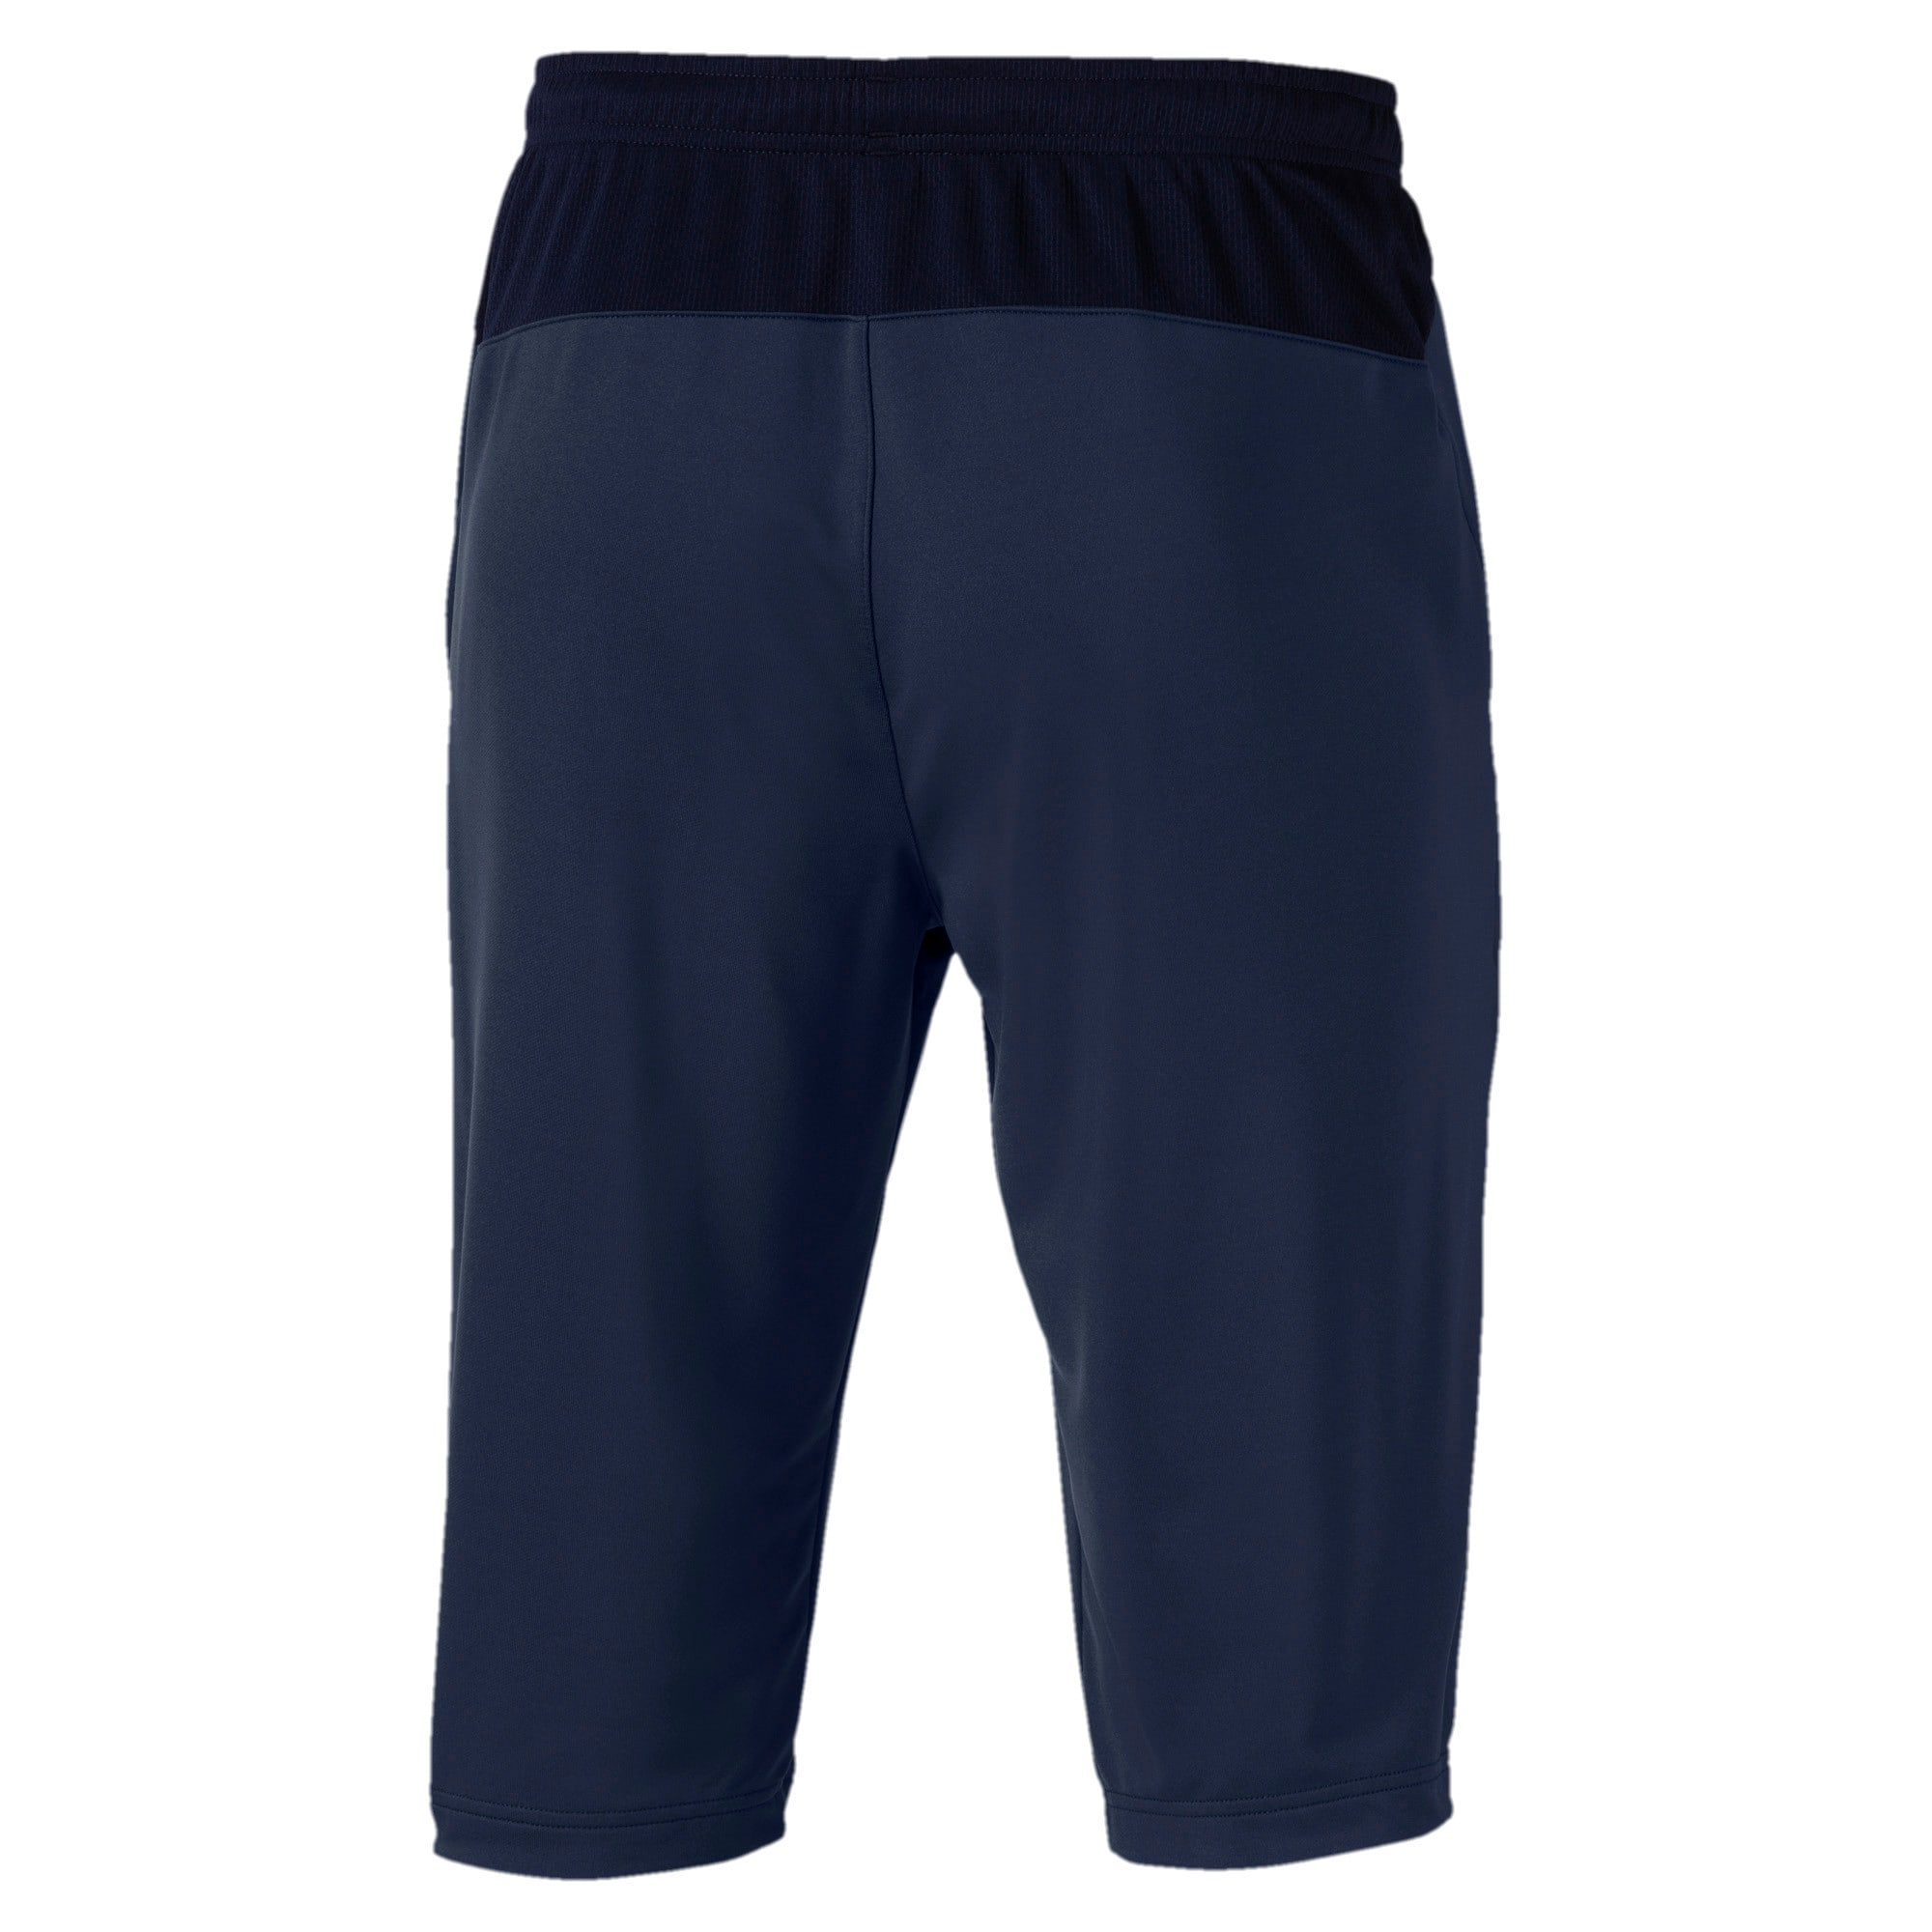 Thumbnail 5 of Chivas Men's 3/4 Training Pants, Peacoat, medium